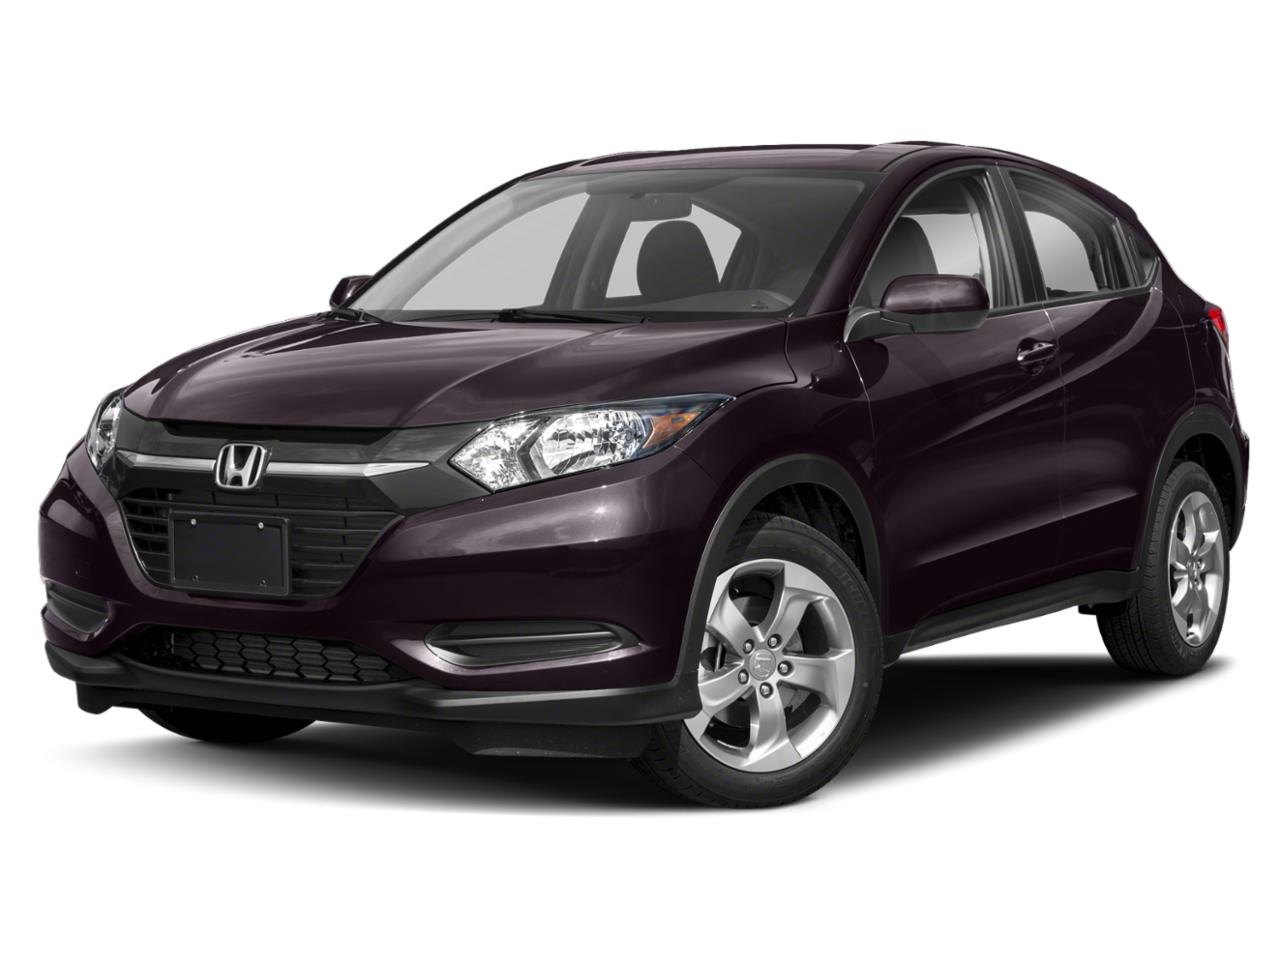 2018 Honda HR-V Vehicle Photo in San Antonio, TX 78238